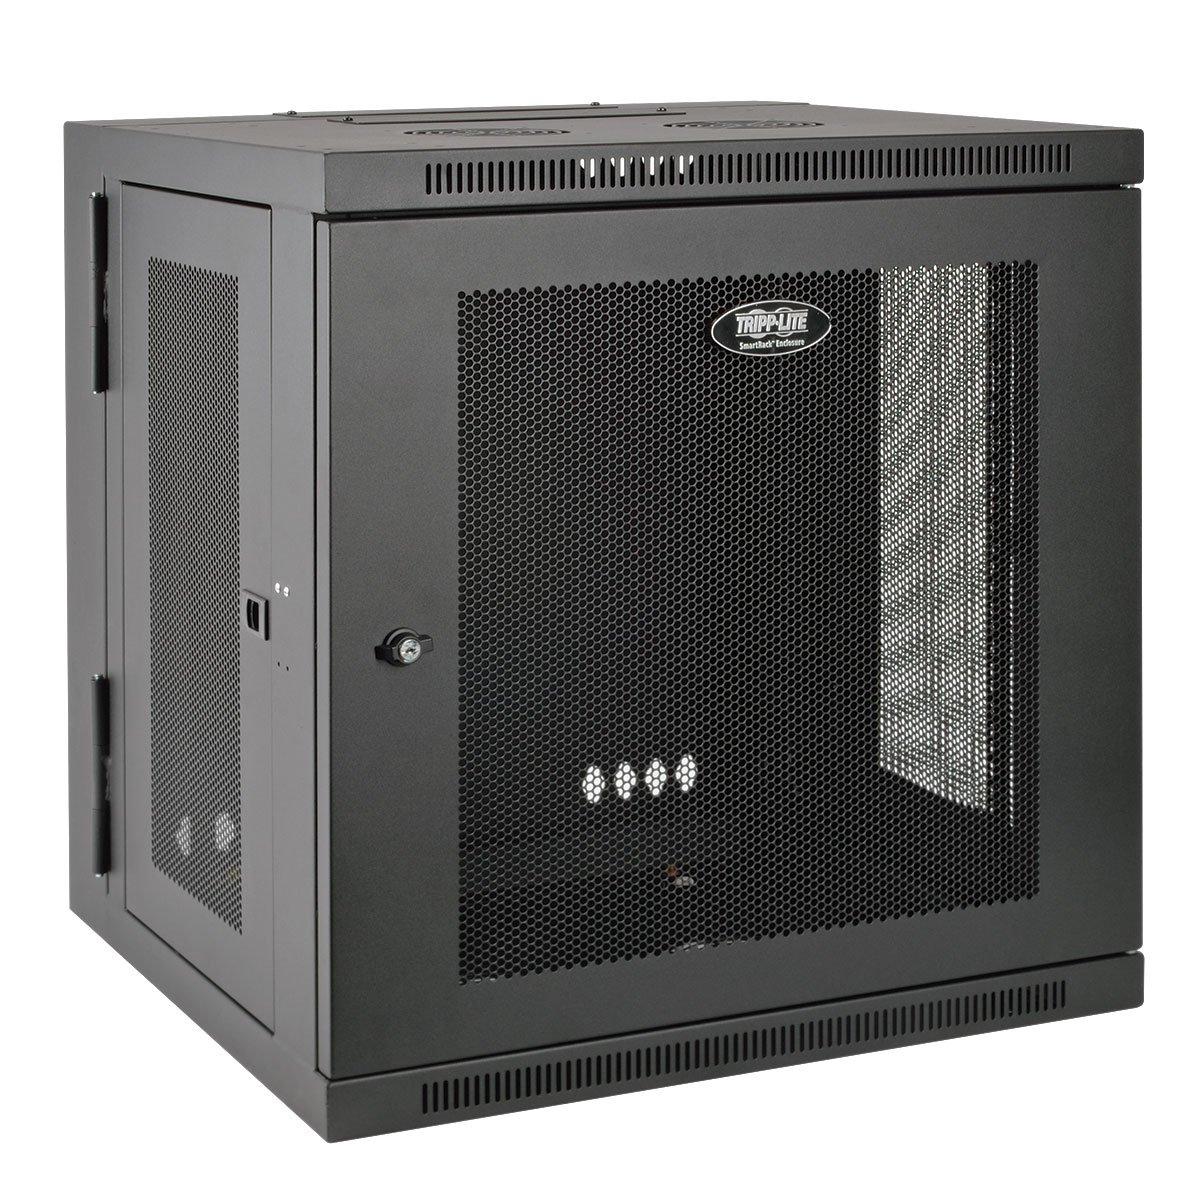 Tripp Lite 10U Wall Mount Rack Enclosure Server Cabinet, Hinged, 20.5'' Deep, Switch-Depth (SRW10US)